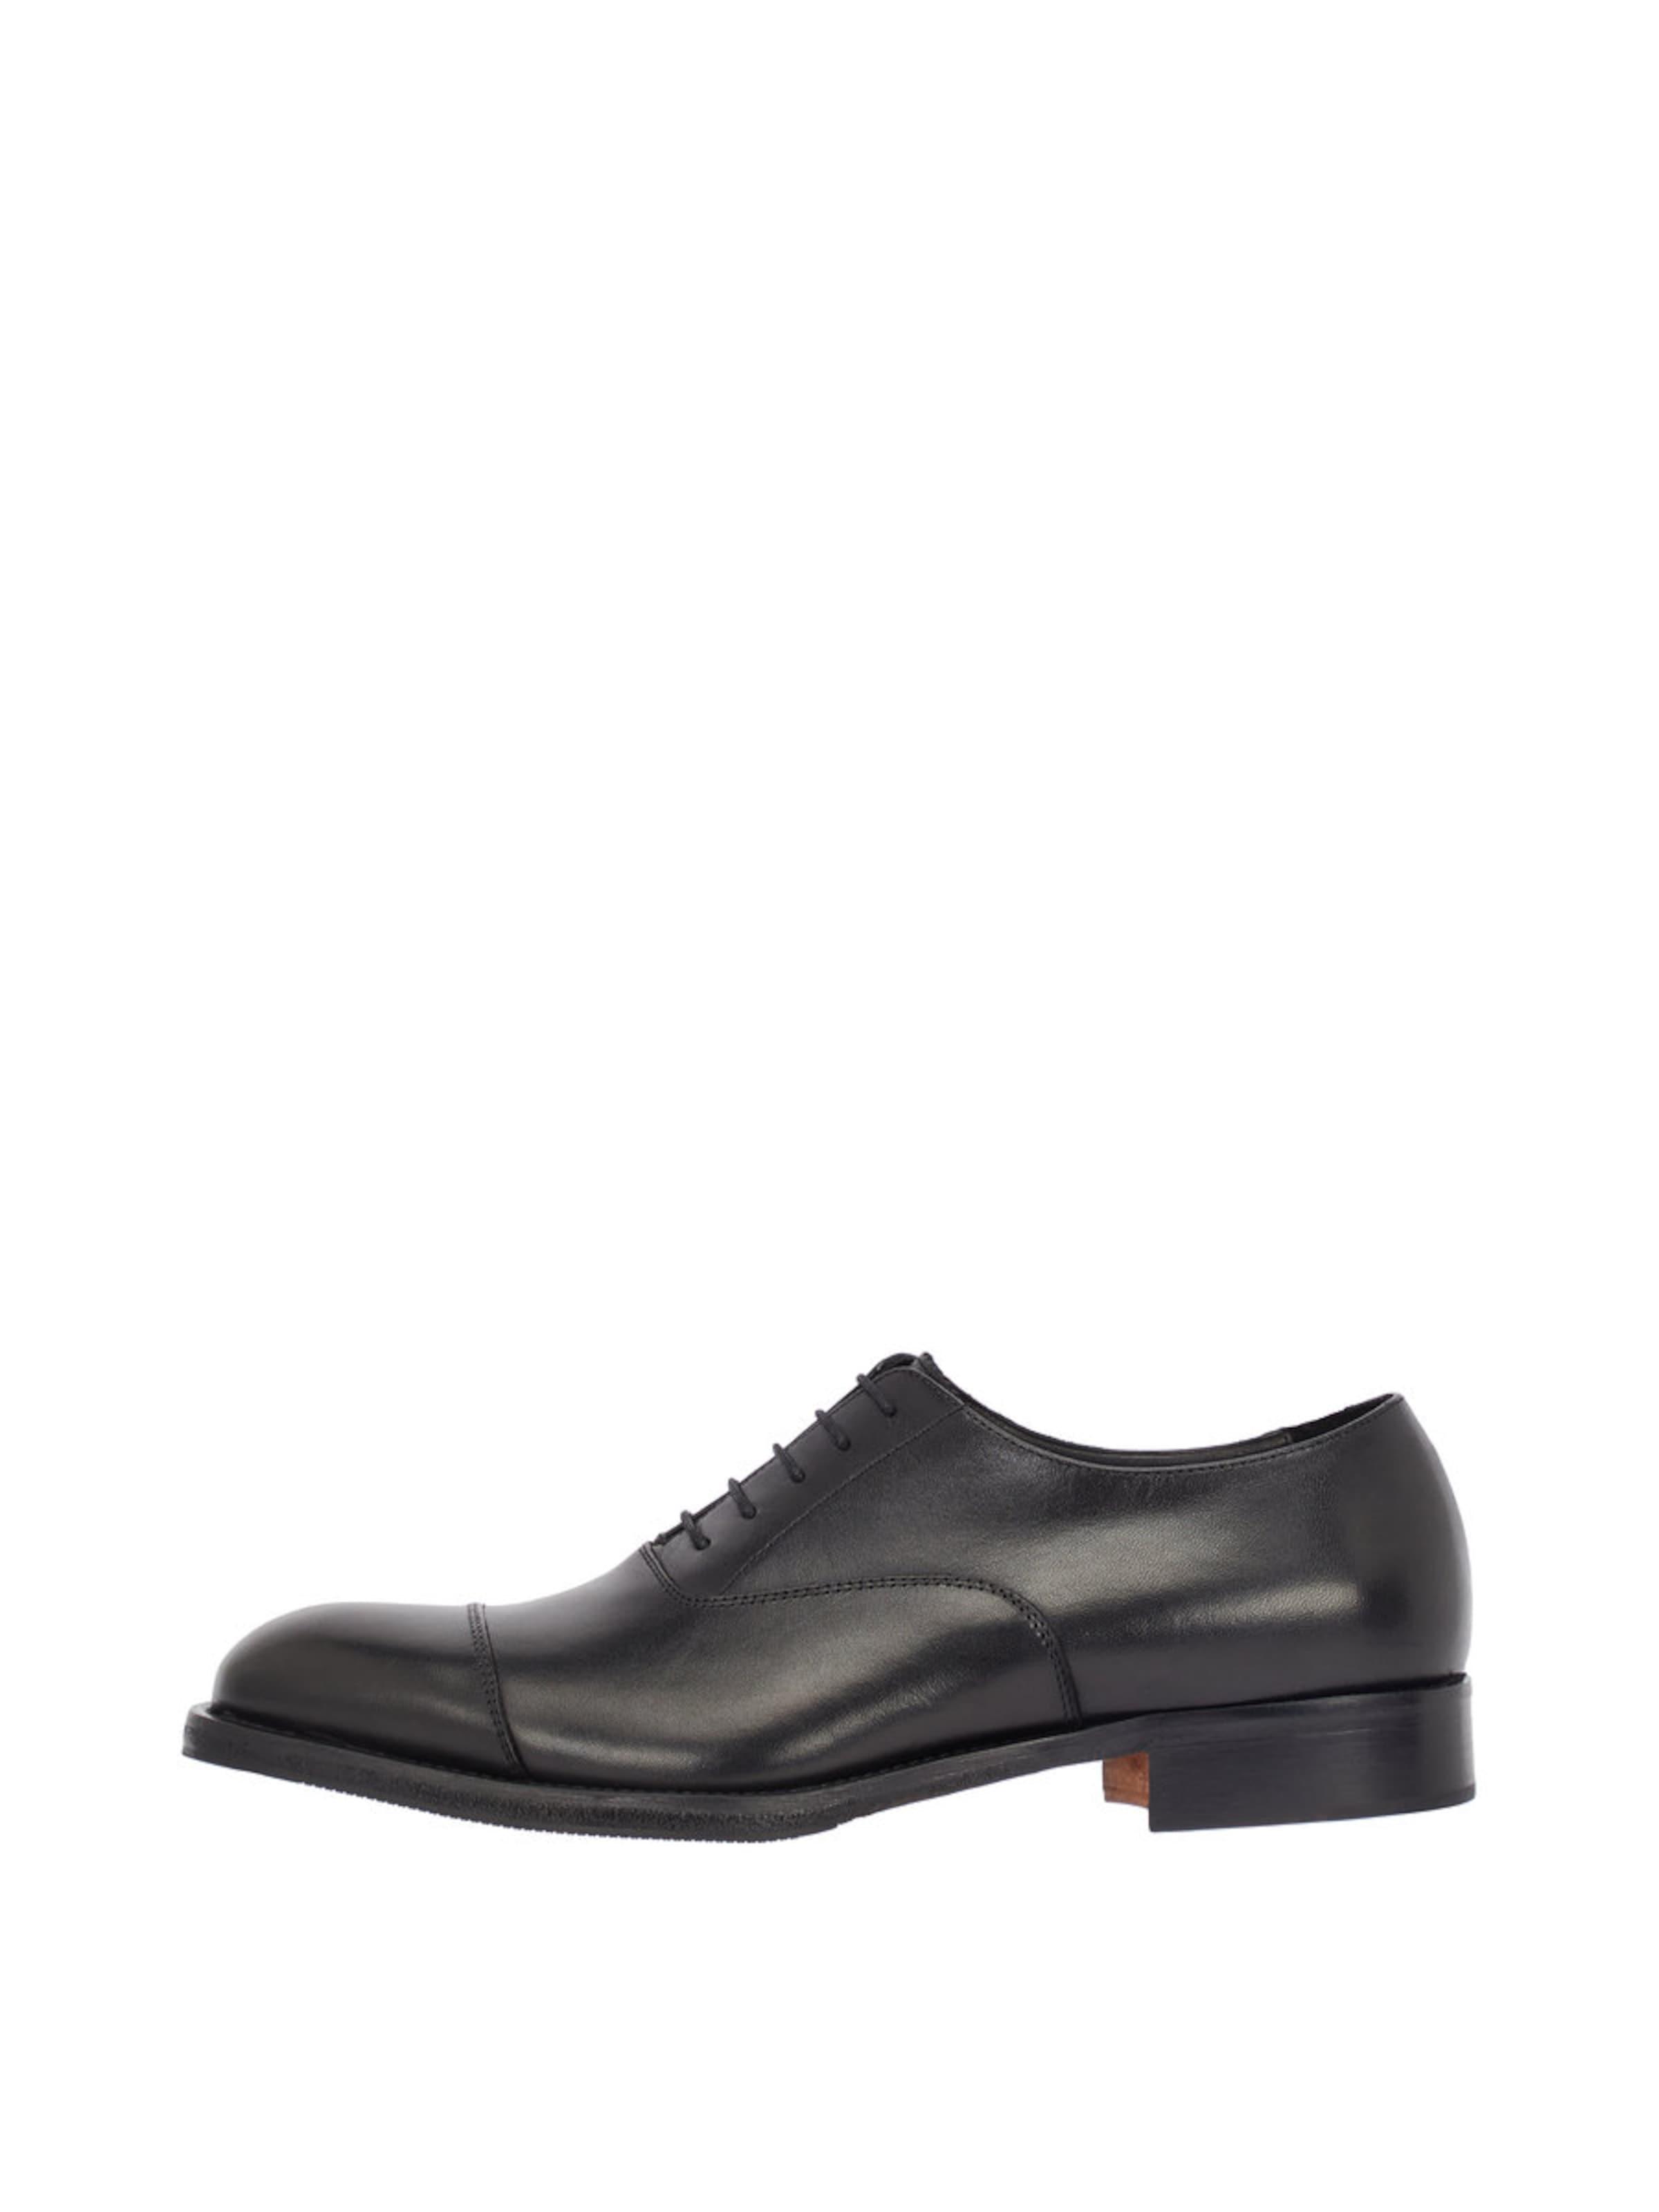 J.Lindeberg Schuhe Hopper Verschleißfeste billige Schuhe